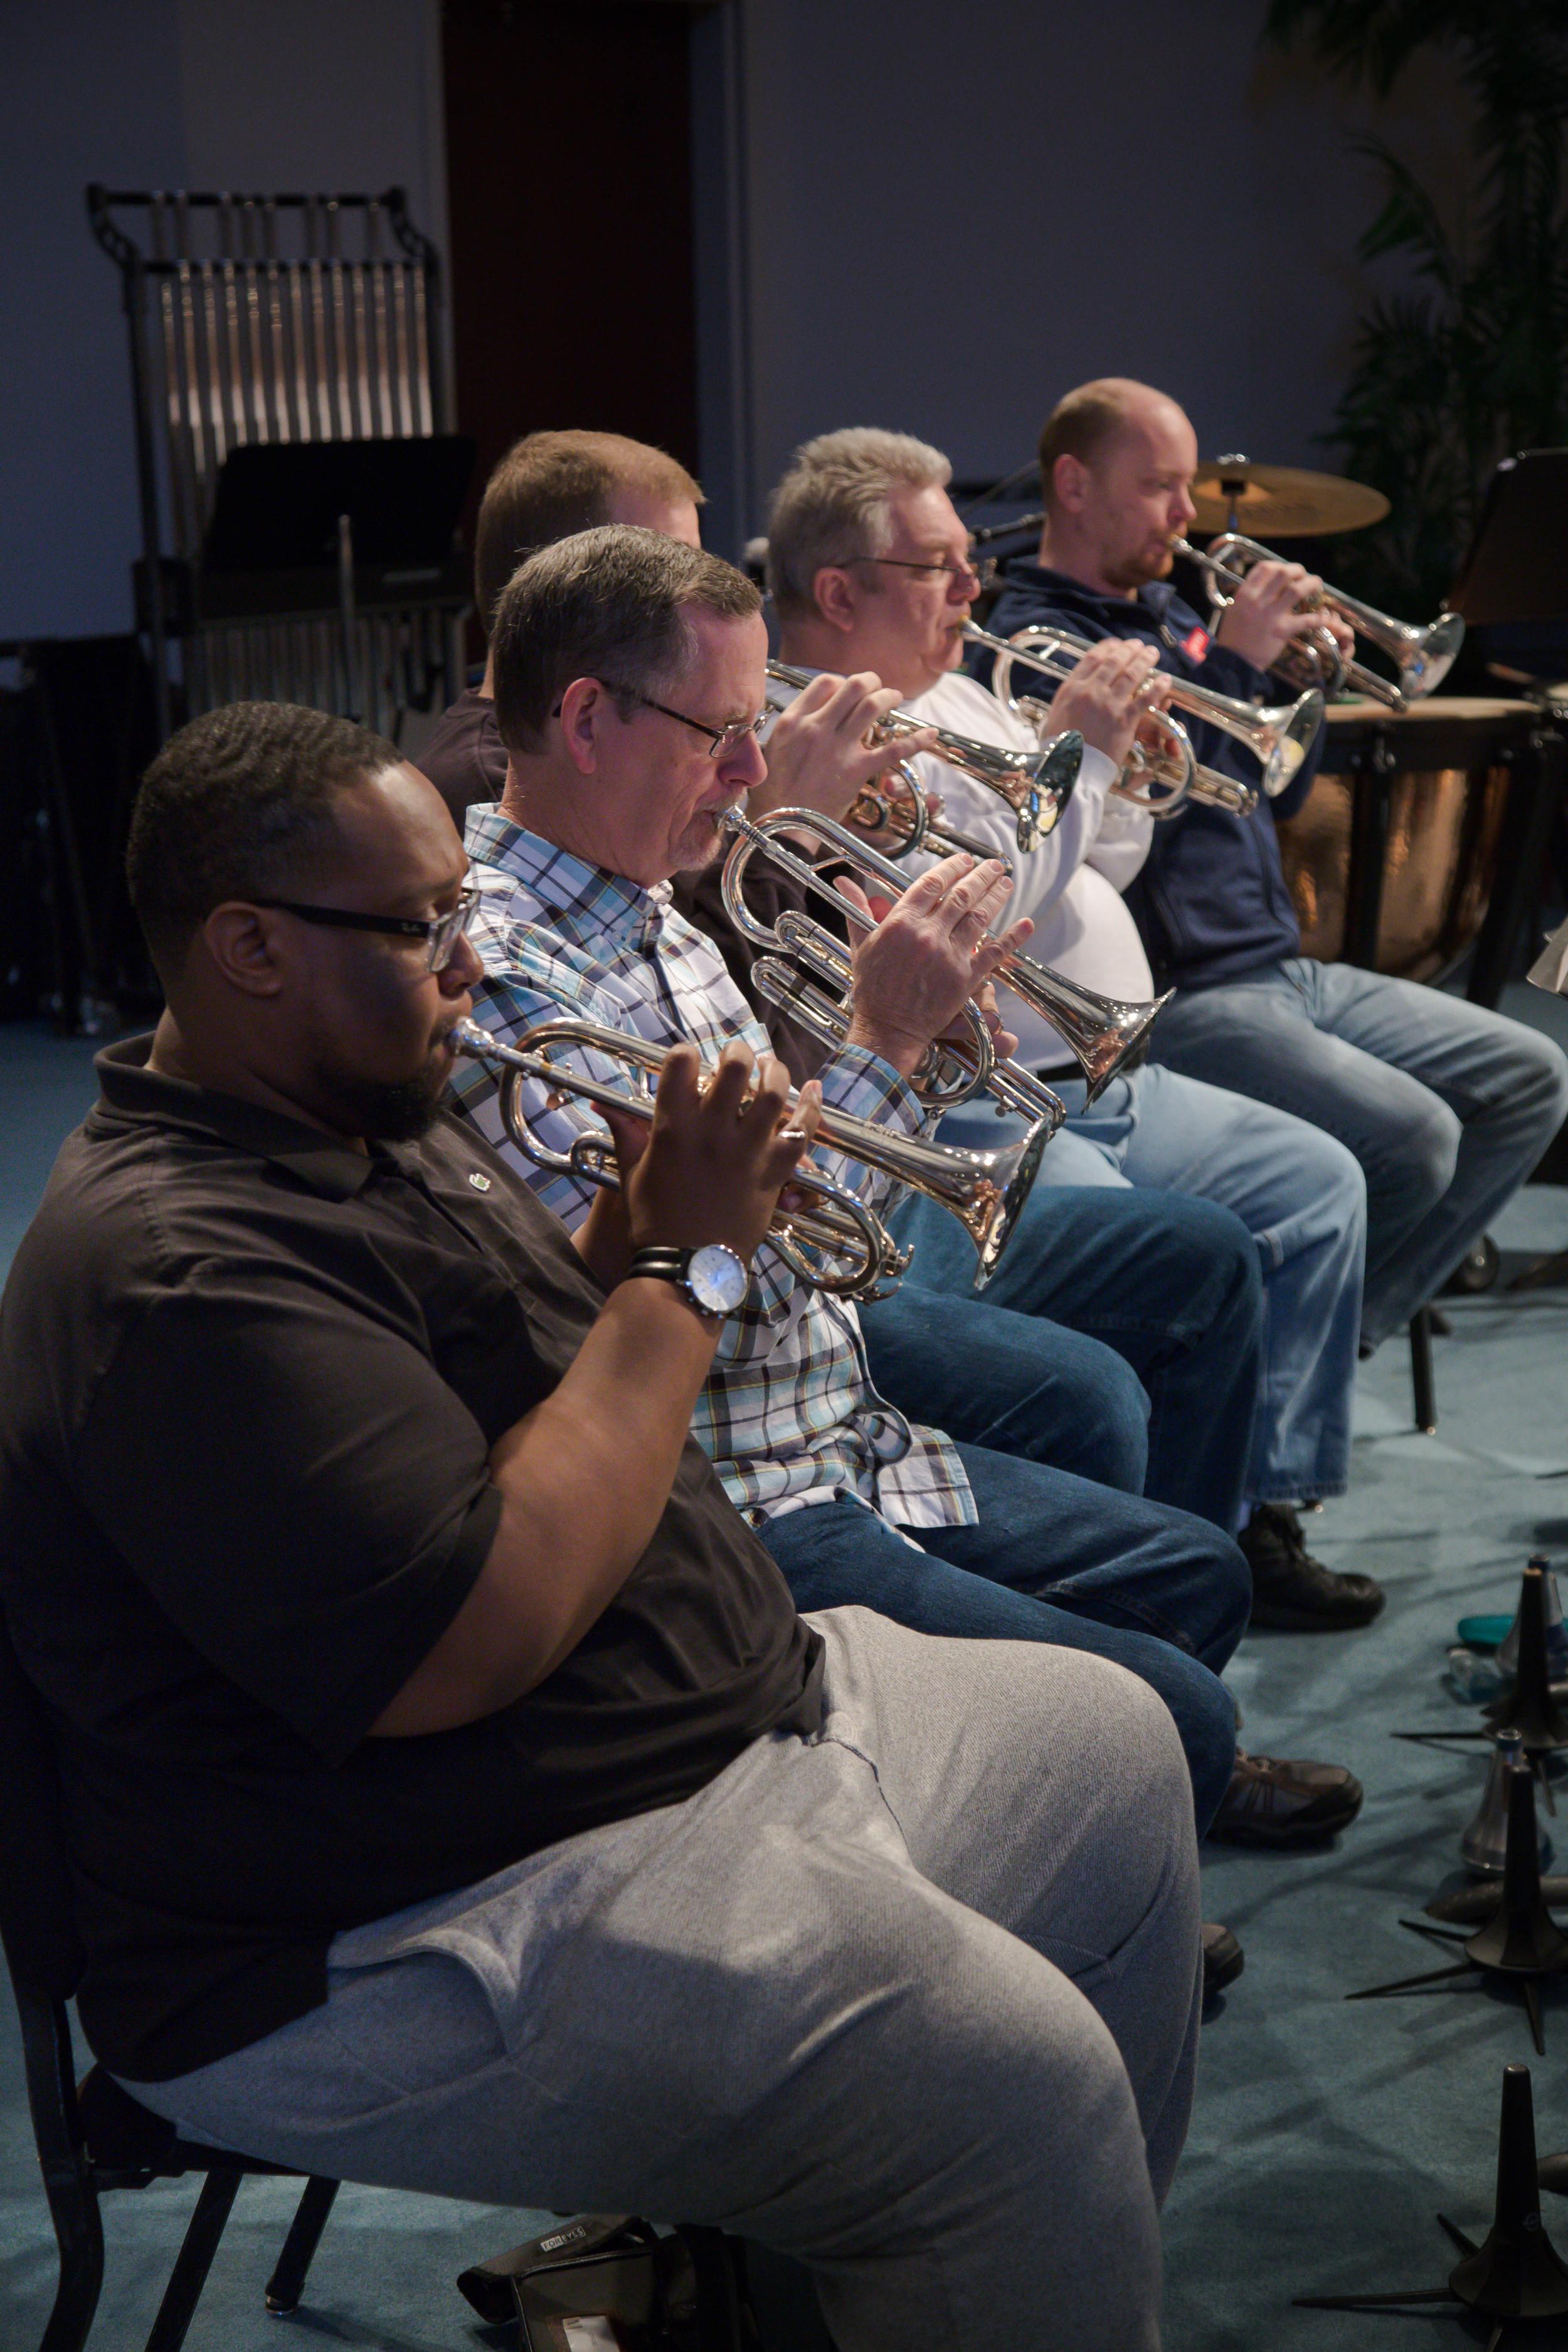 Back row cornets: Darryl Crossland (Soprano cornet),Paul Bridges, Andy Curless, Chip Seiler, Jeremy Leach